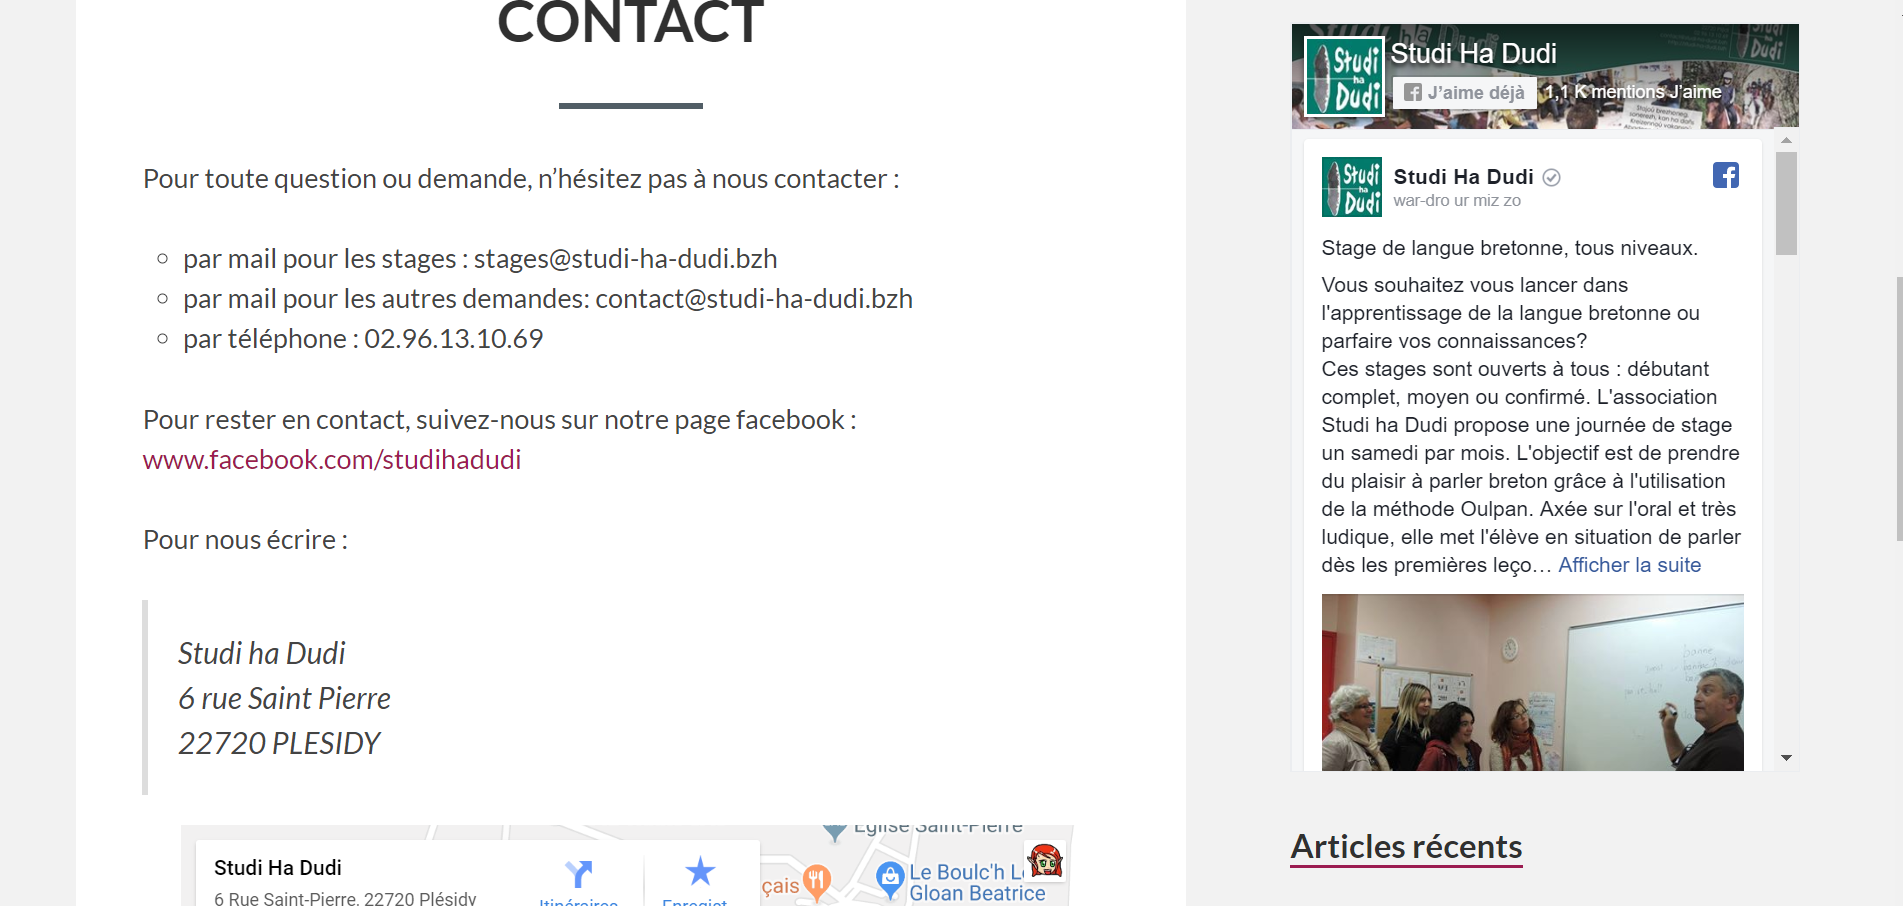 Contact – Studi ha Dudi